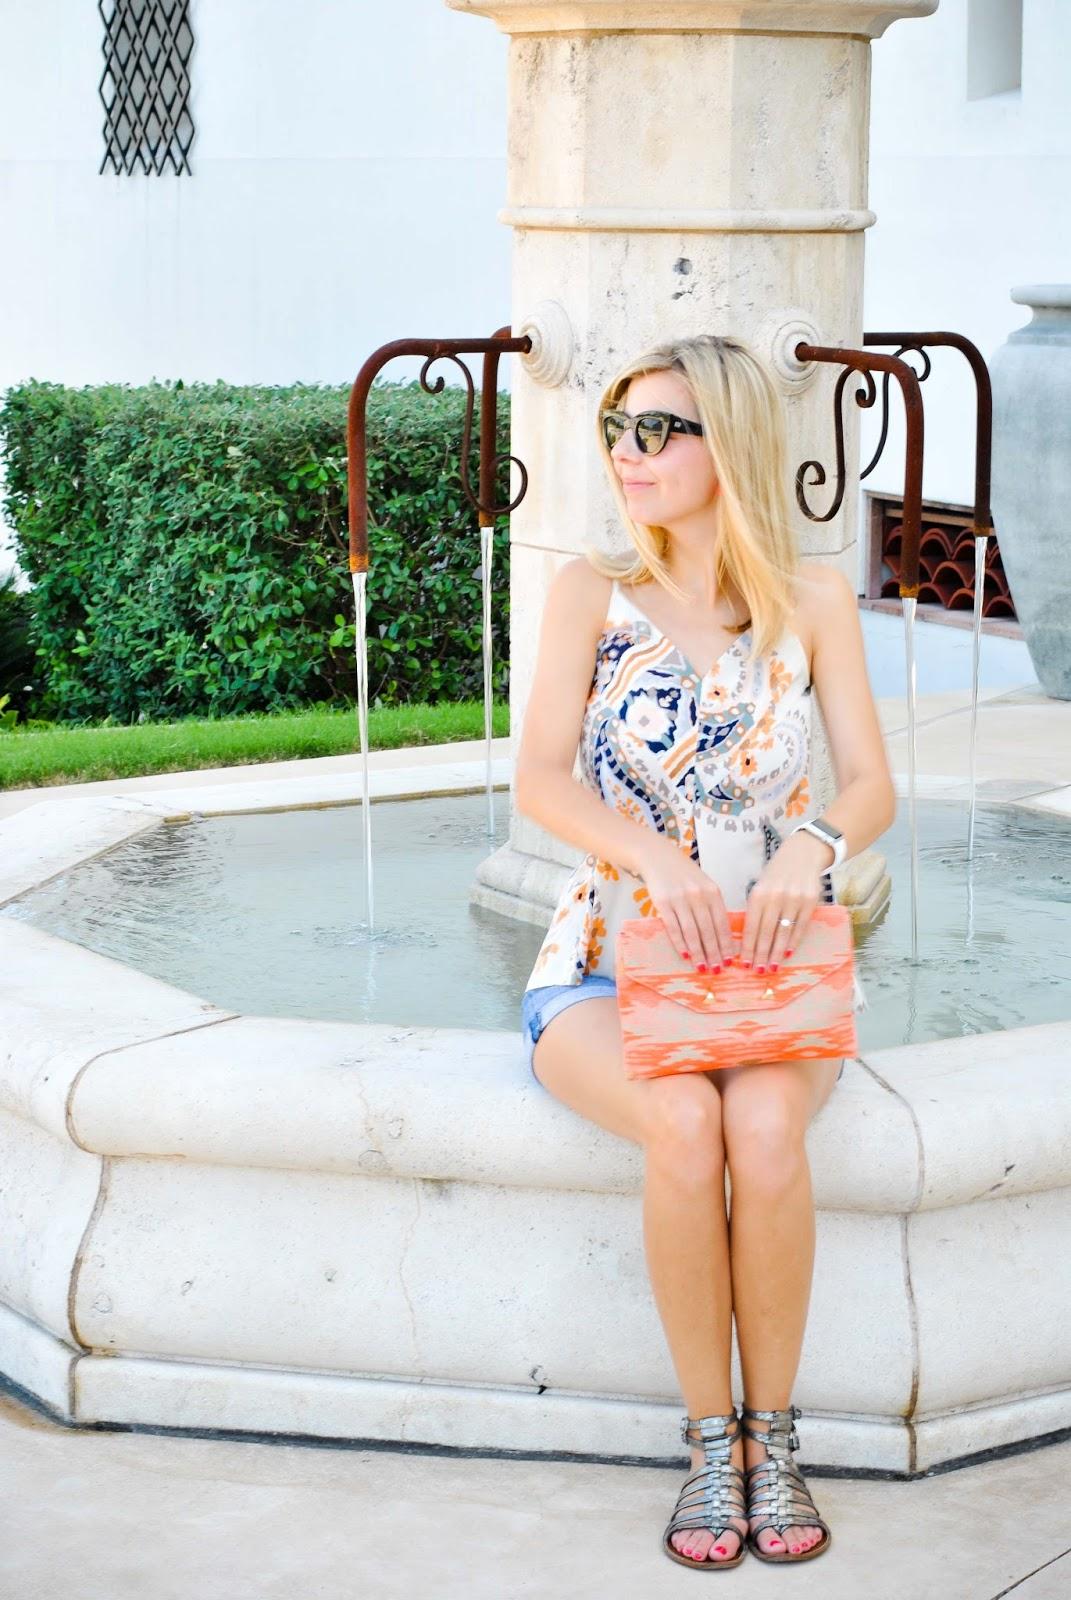 Austin Style Blog - The Chic Burrow